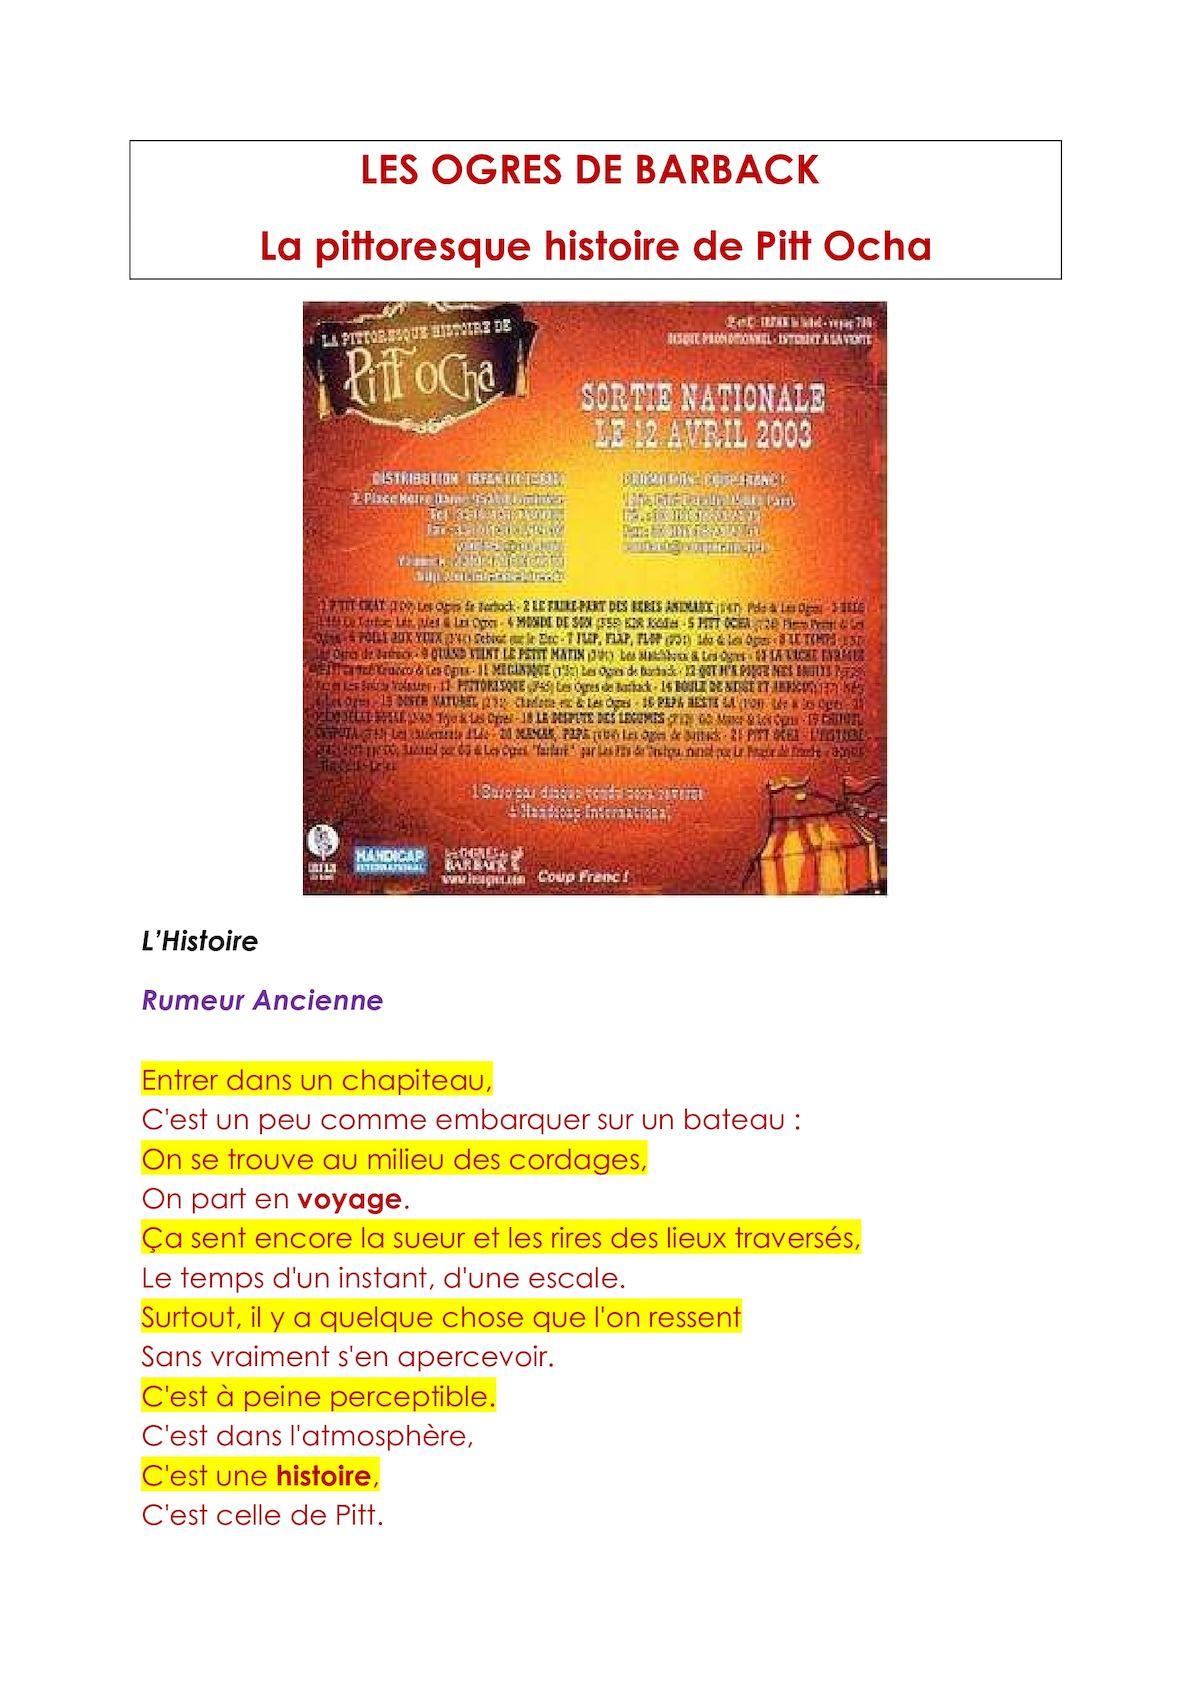 Les Ogres De Barback La Pittoresque Histoire De Pitt'ocha : ogres, barback, pittoresque, histoire, pitt'ocha, Calaméo, Ogres, Barback, Pittoresque, Histoire